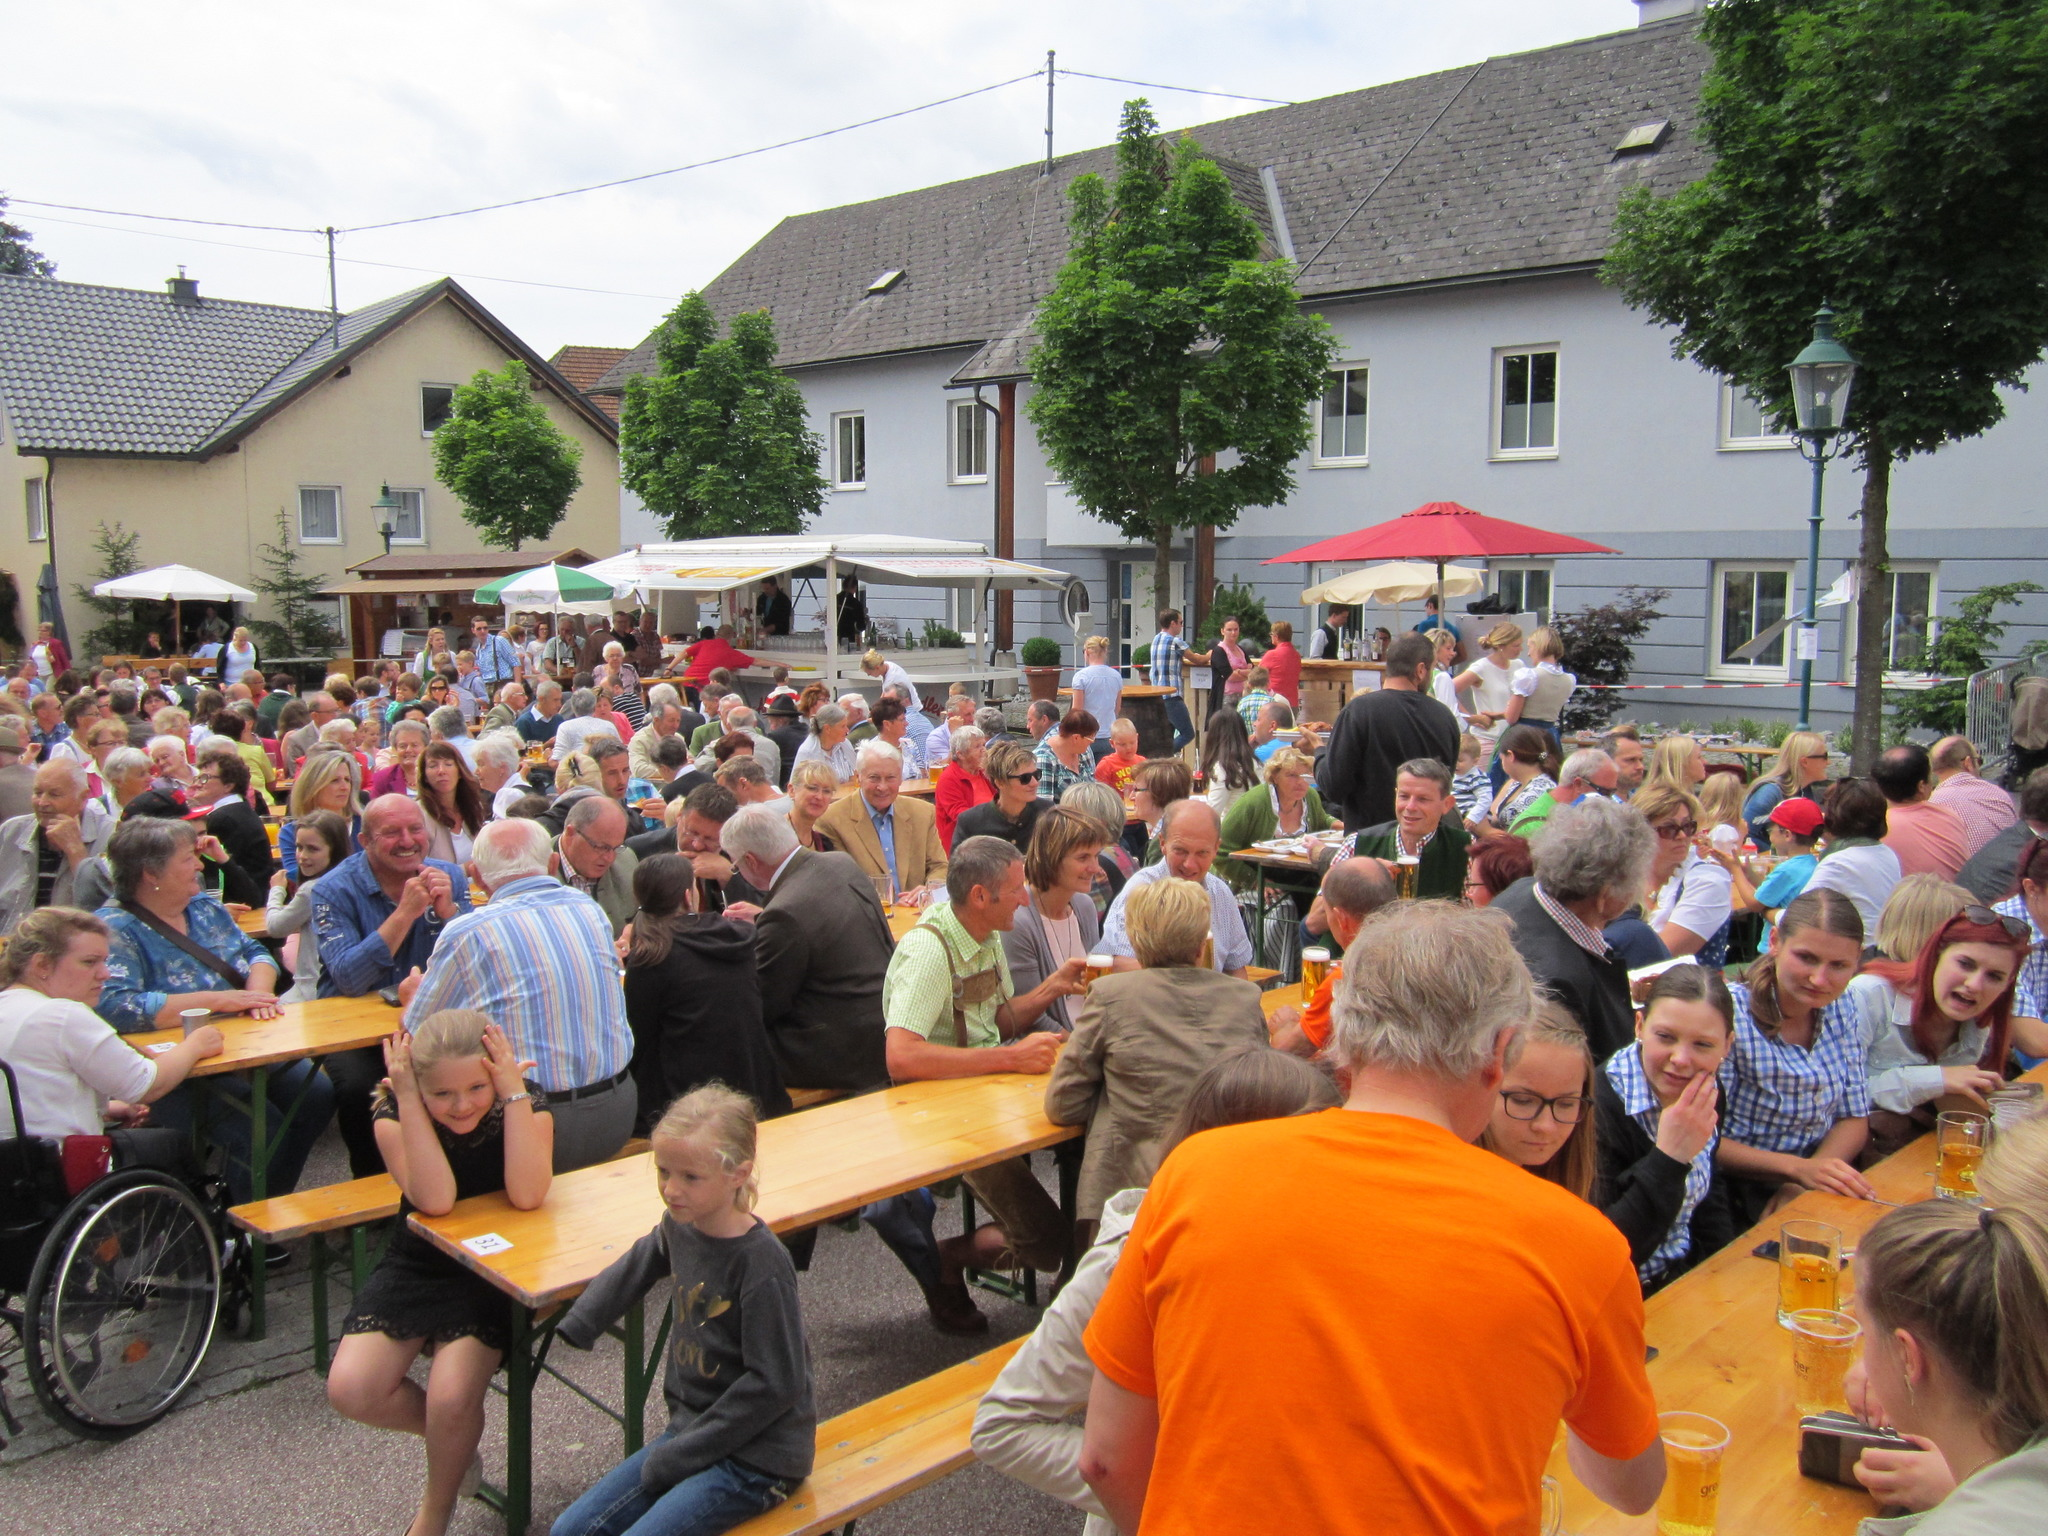 Singles Wartberg An Der Krems, Kontaktanzeigen aus